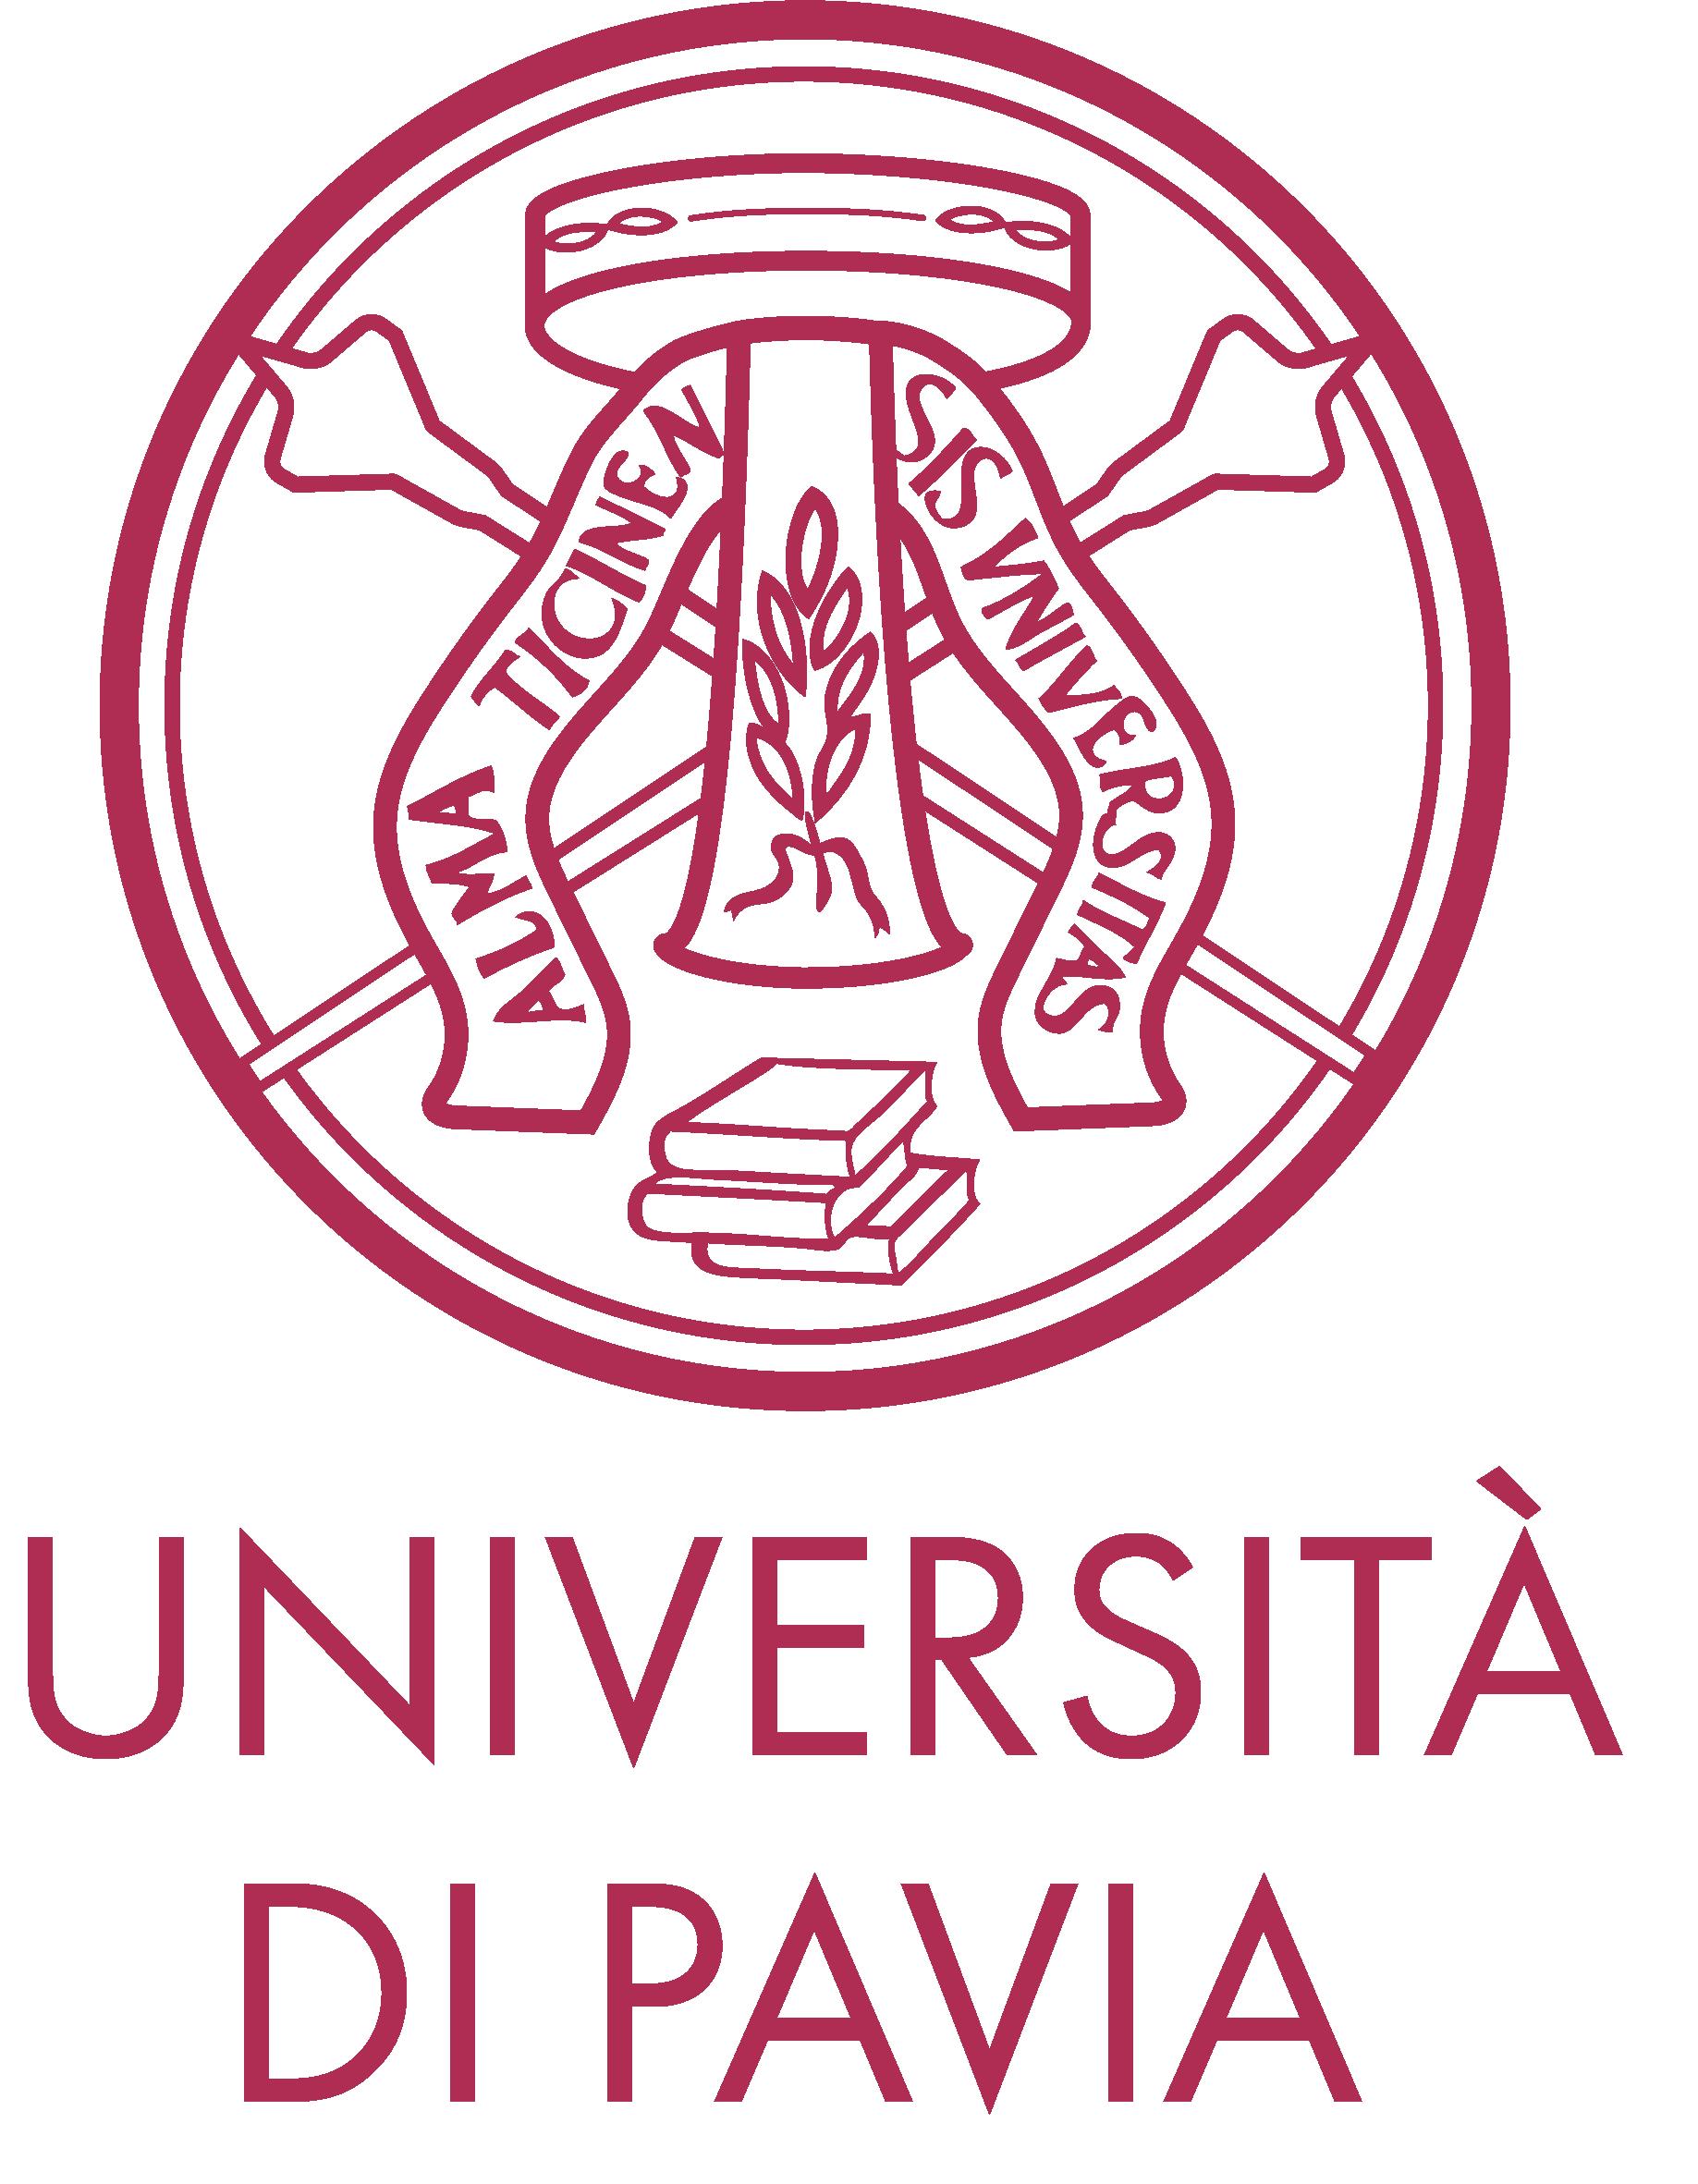 Alberto Zannetti (University of Pavia)